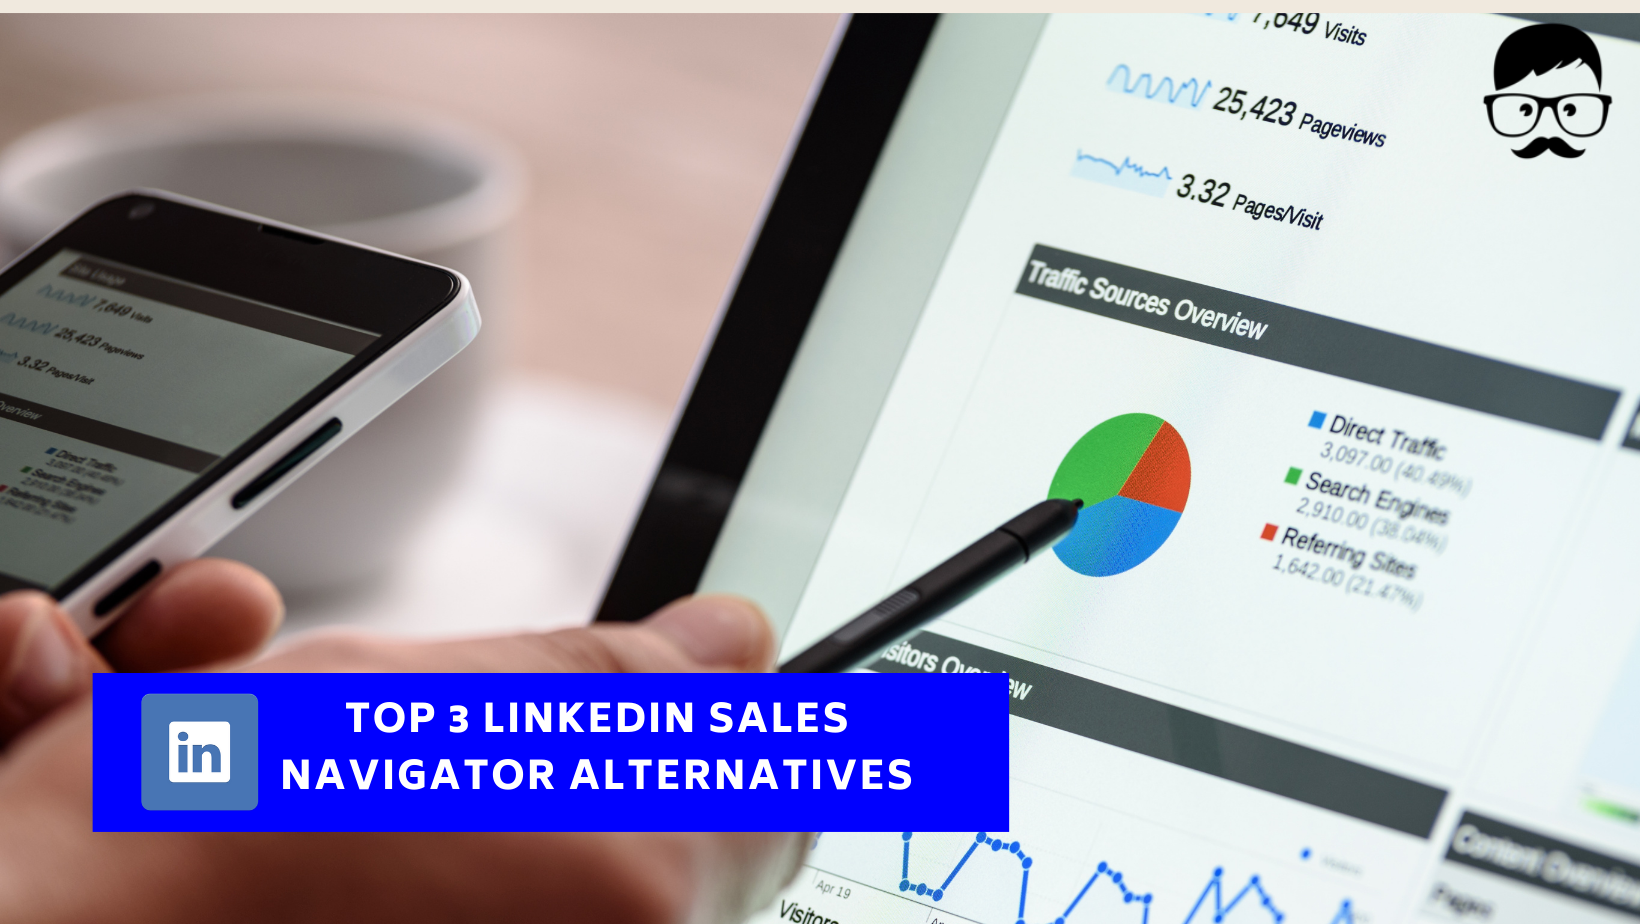 LinkedIn sales navigator tools